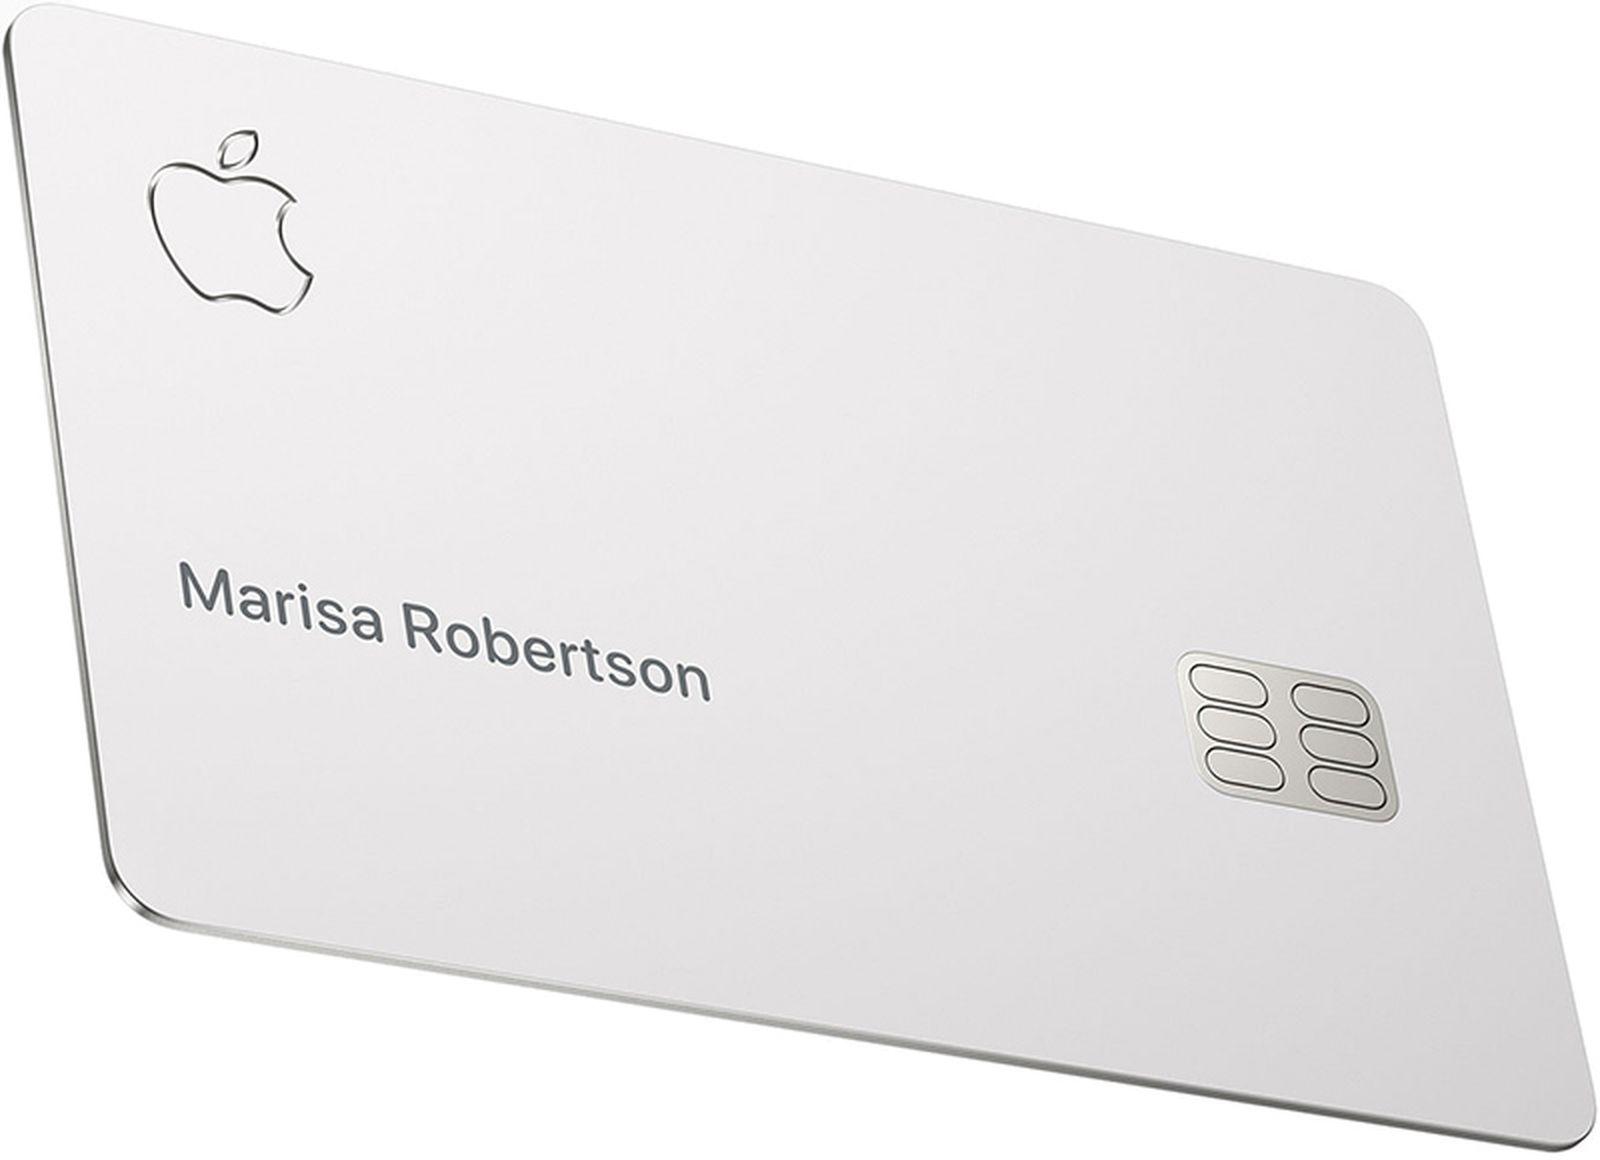 How to Order a Titanium Apple Card - MacRumors